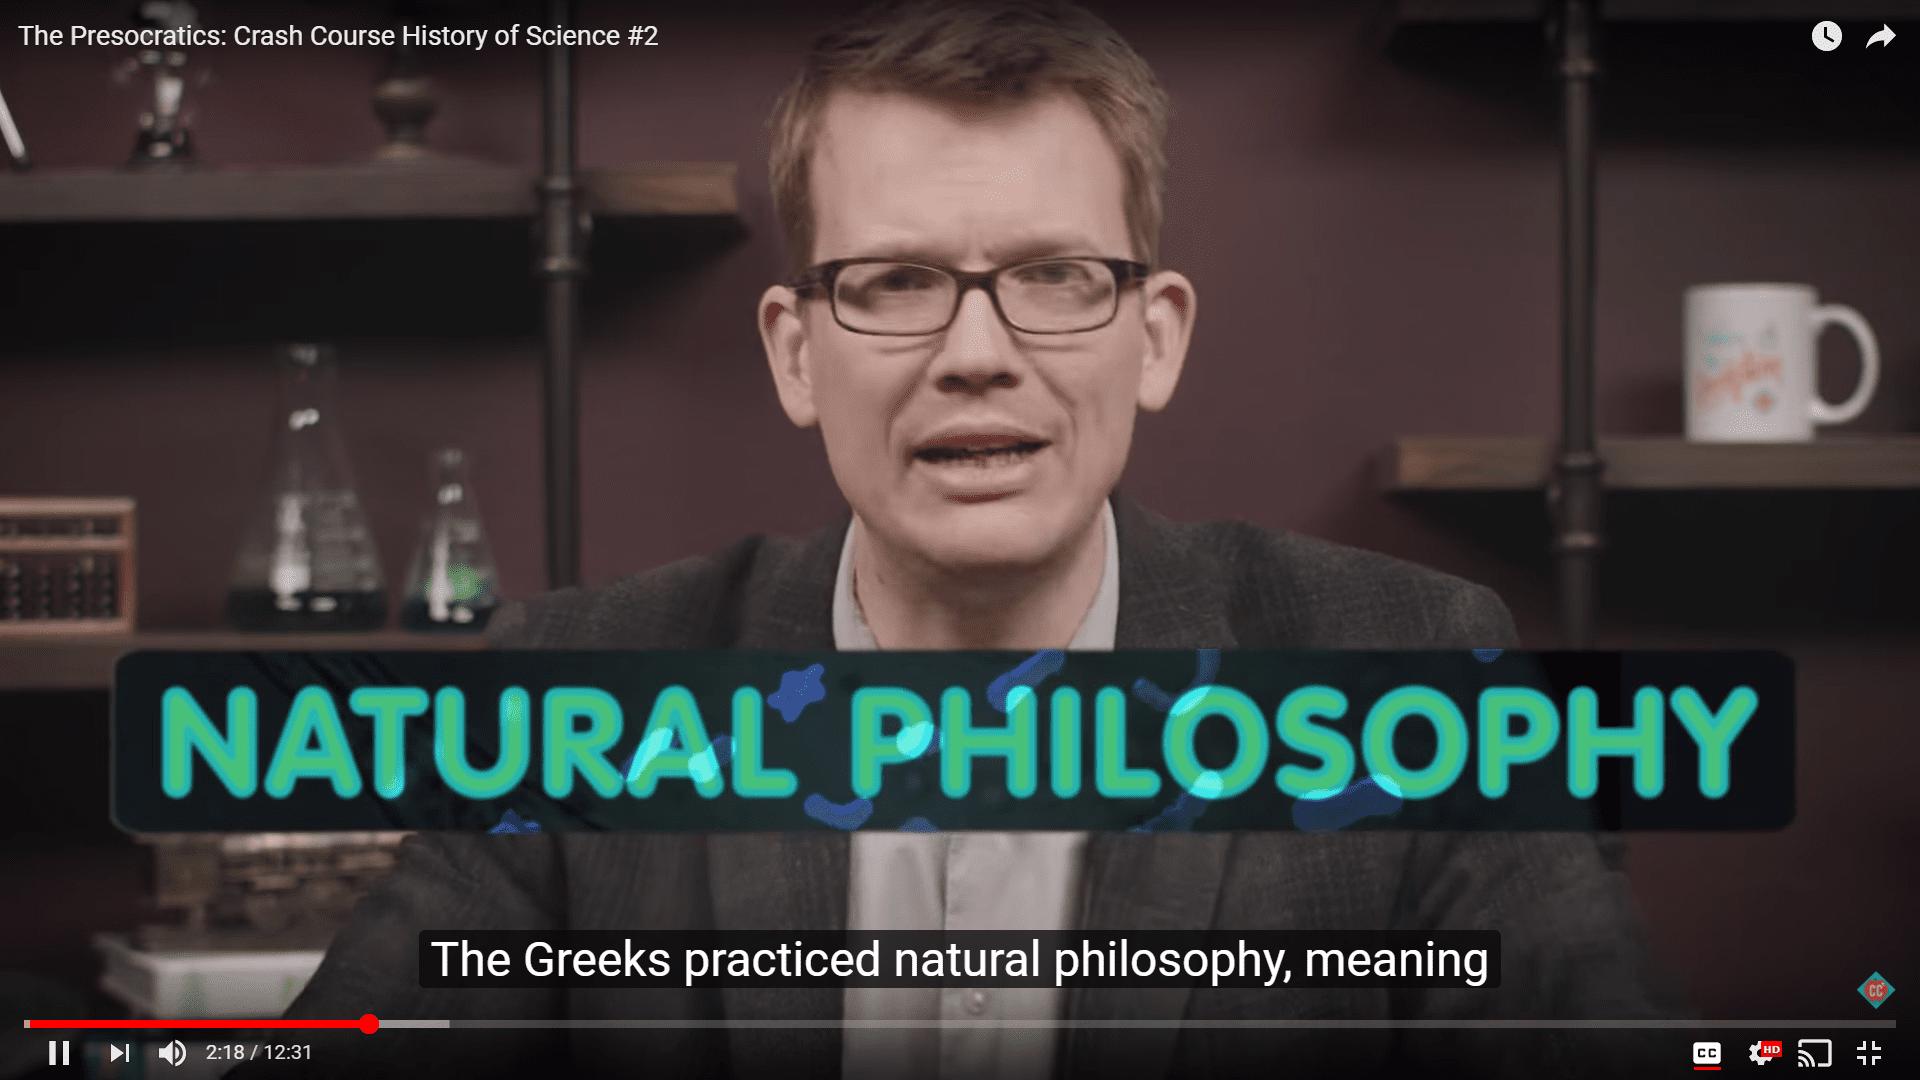 Crash Course host talking about natural philosophy